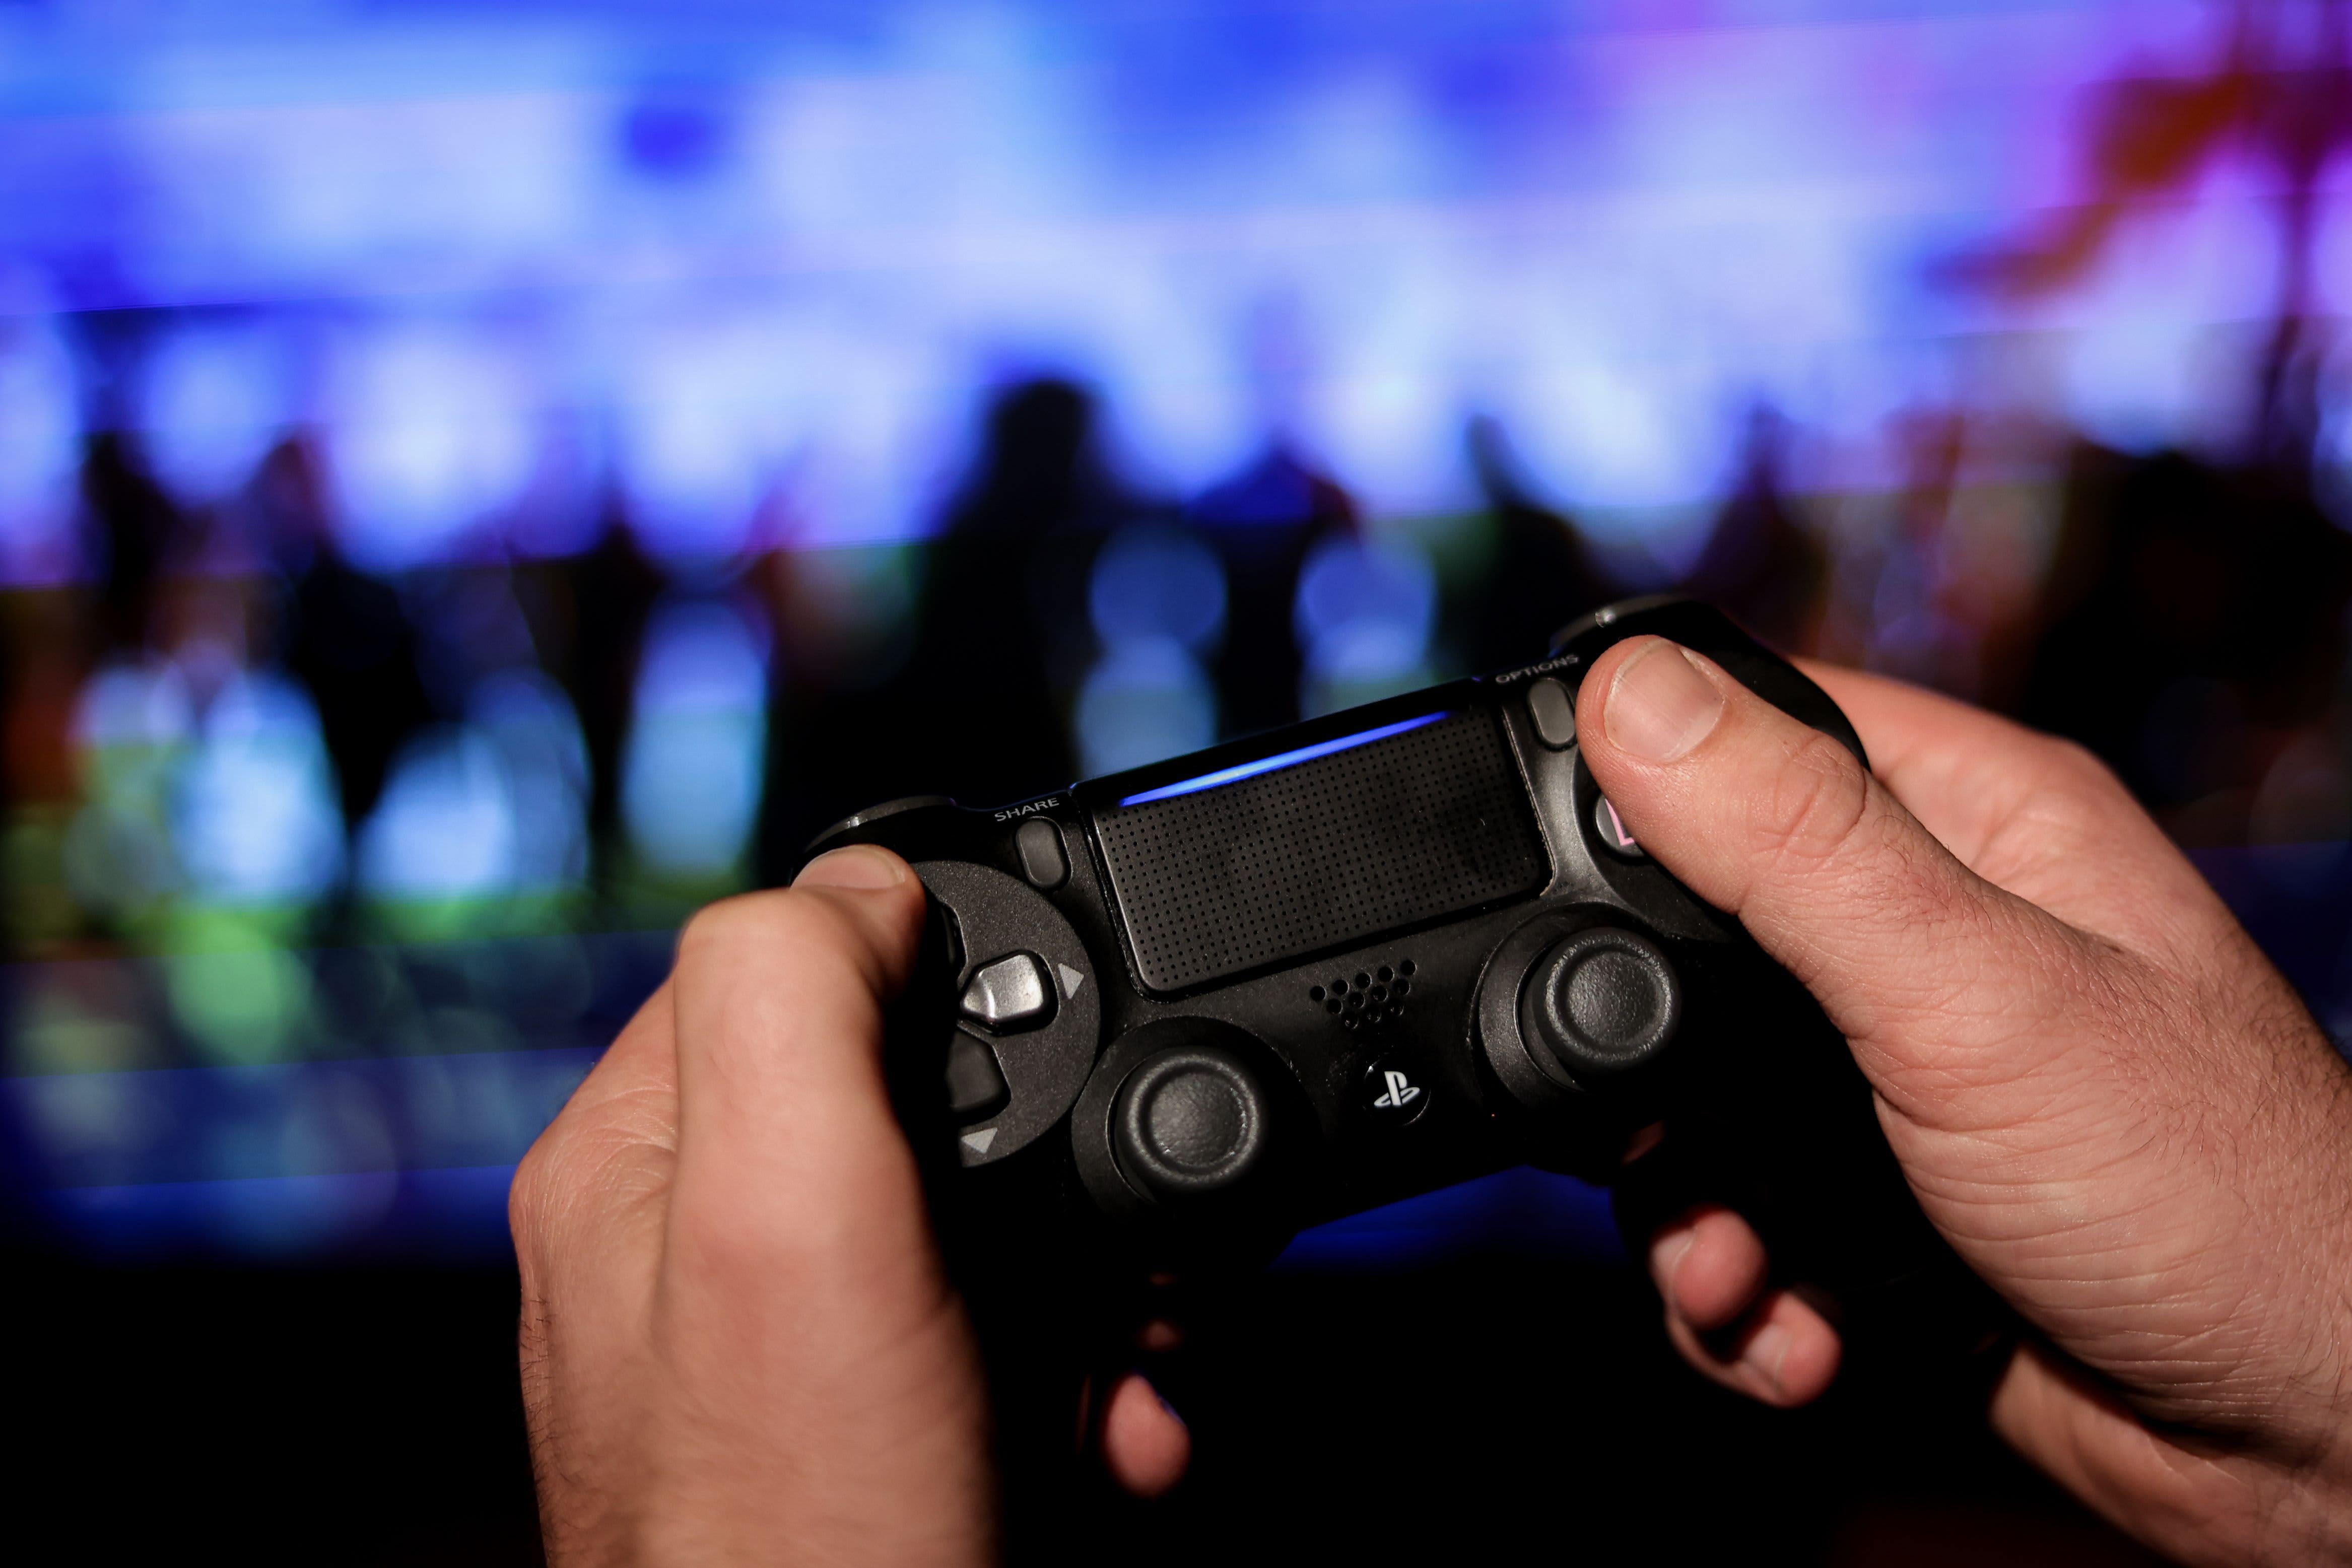 Shares of gaming giant Ubisoft fall despite record quarterly sales - CNBC